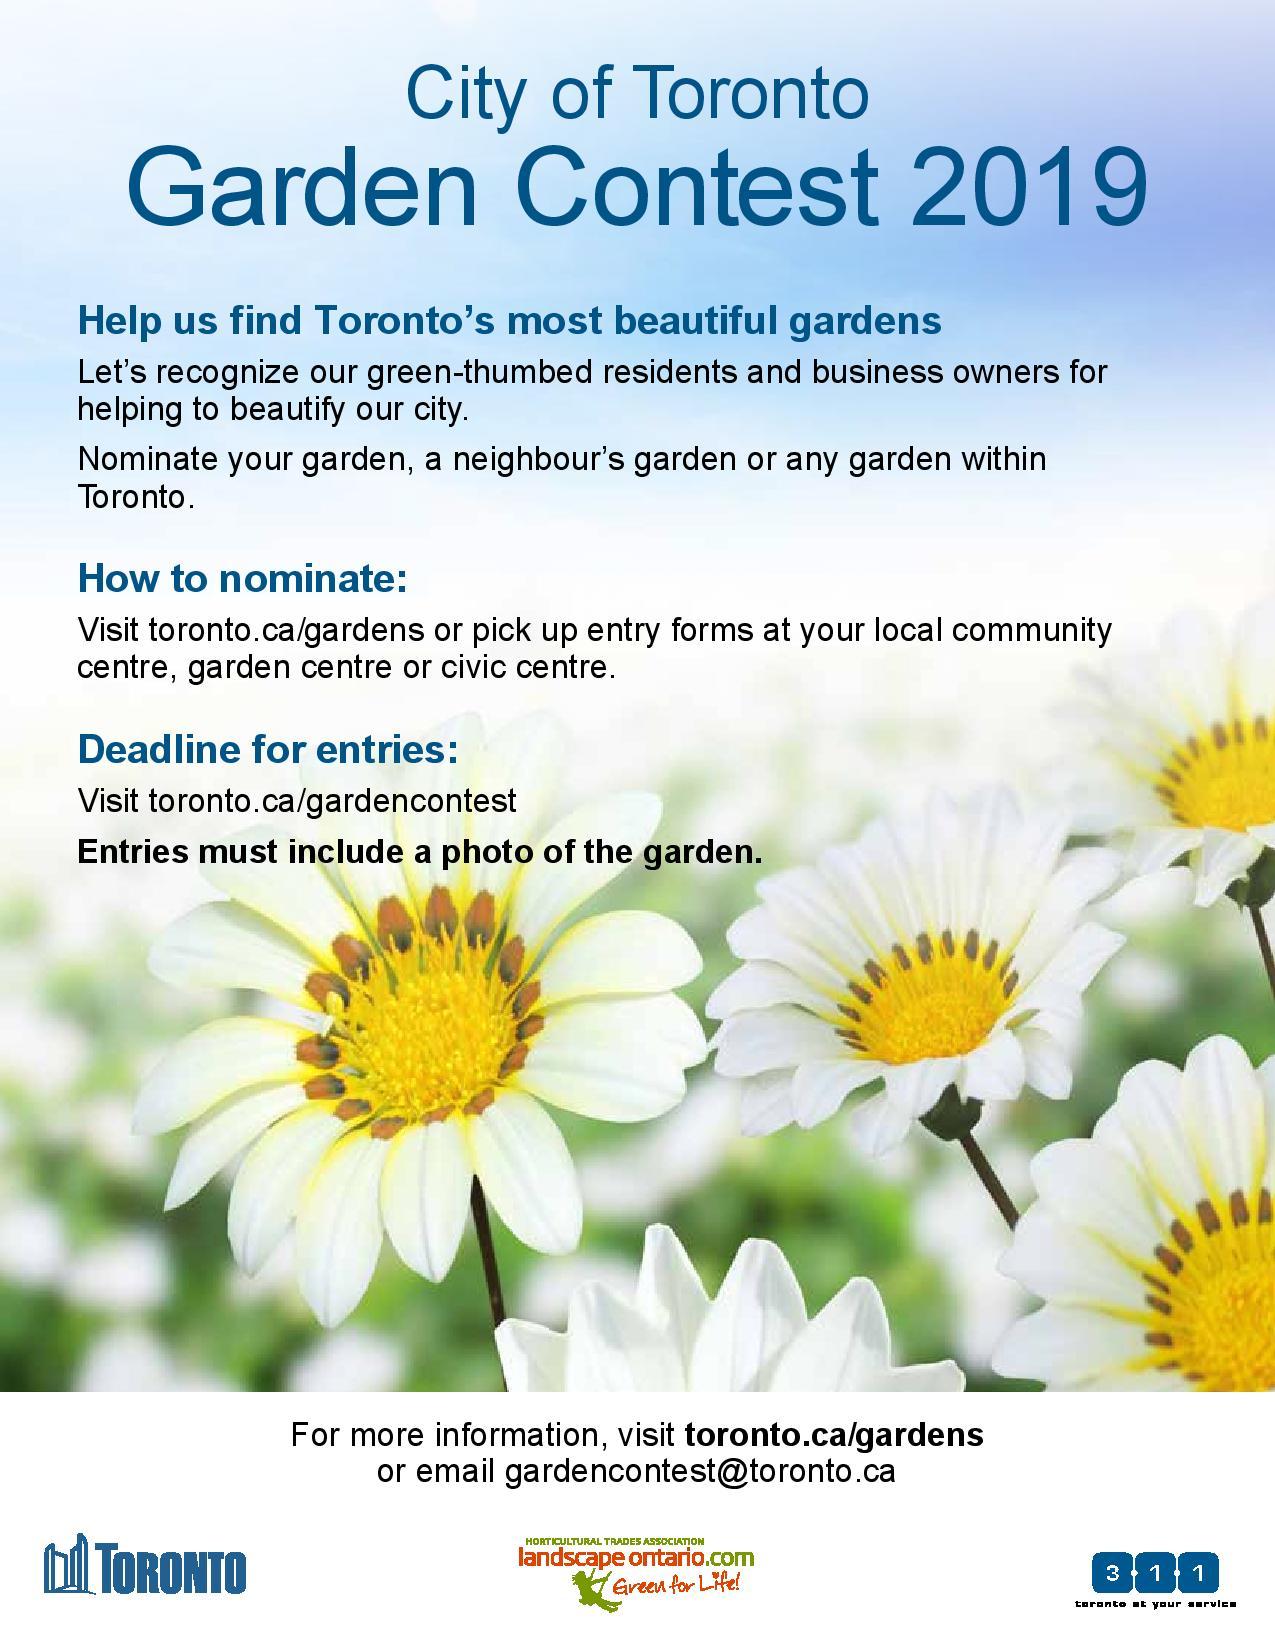 GardenContestFlyer2019-page-001.jpg